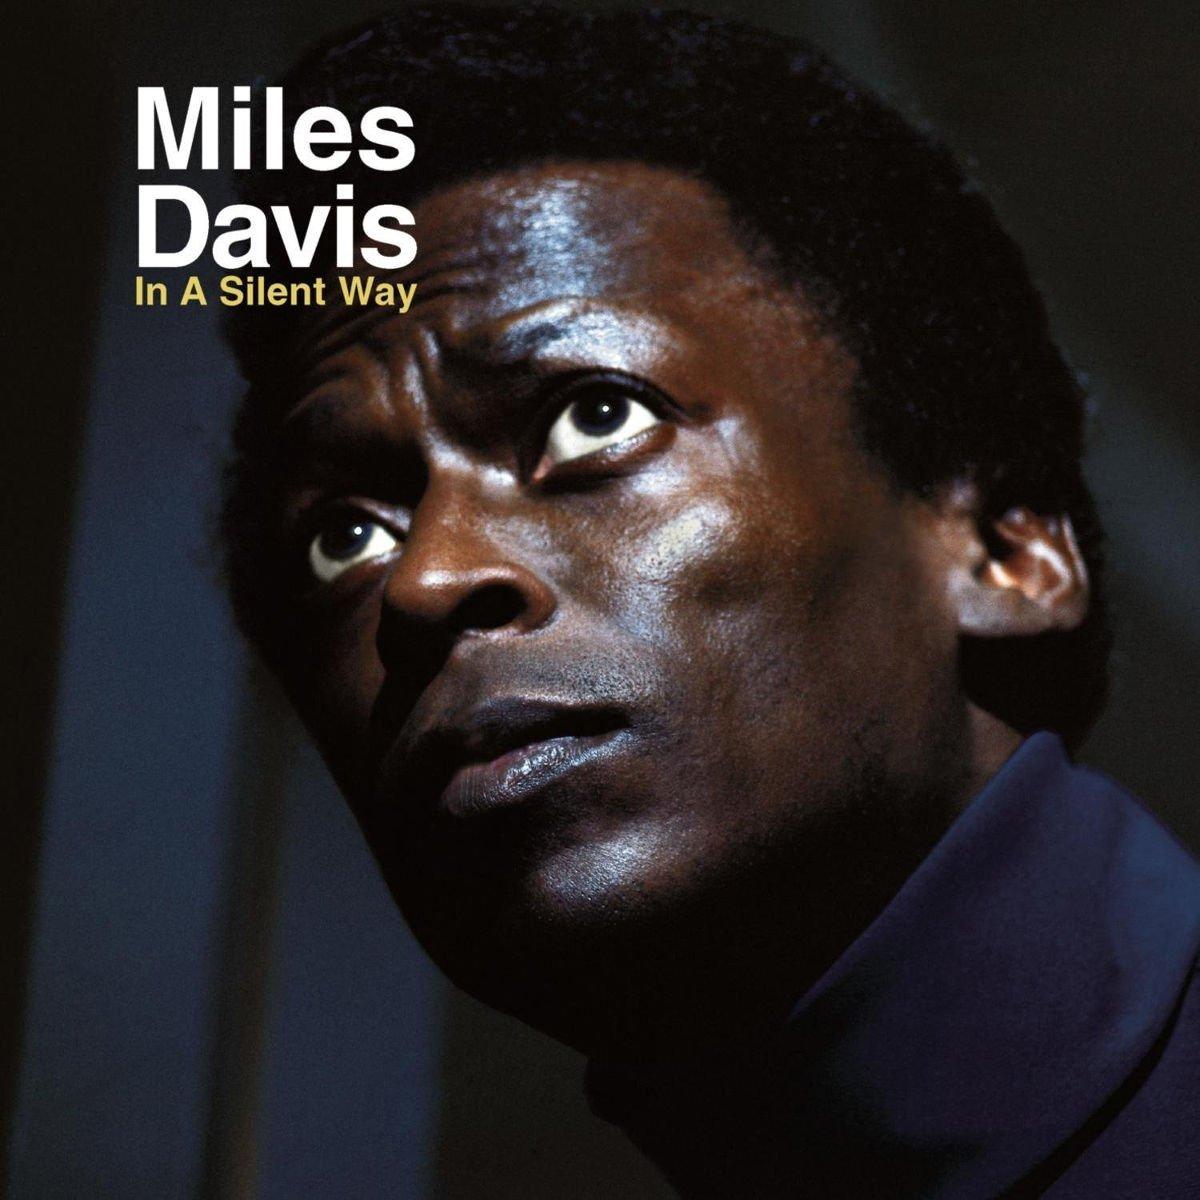 Miles Davis In A Silent Way Album Cover